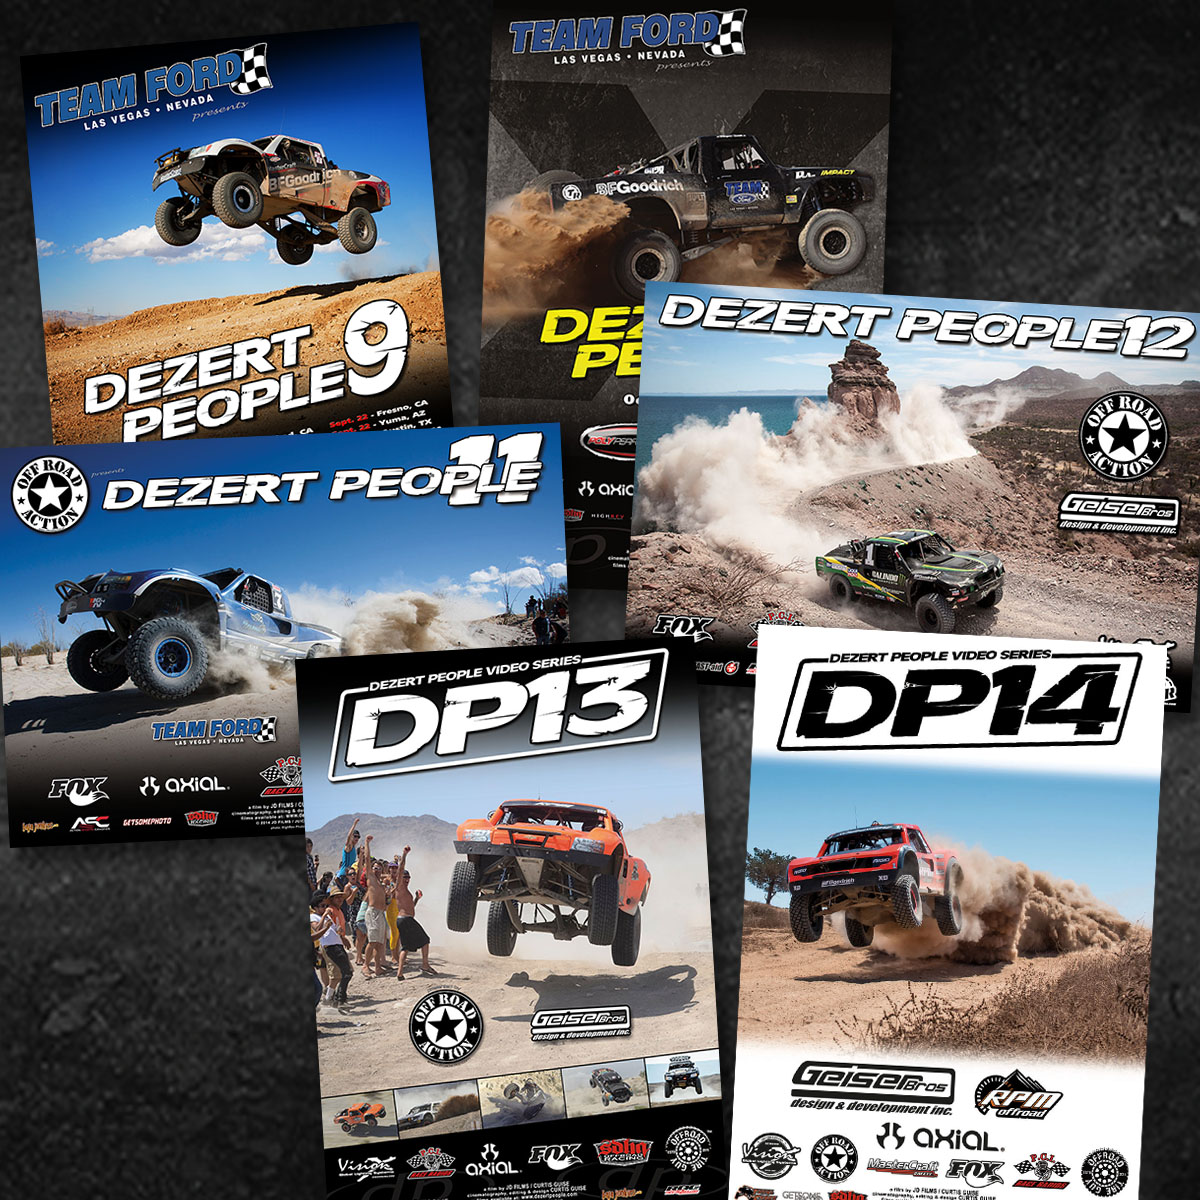 DP9-14_posters.jpg